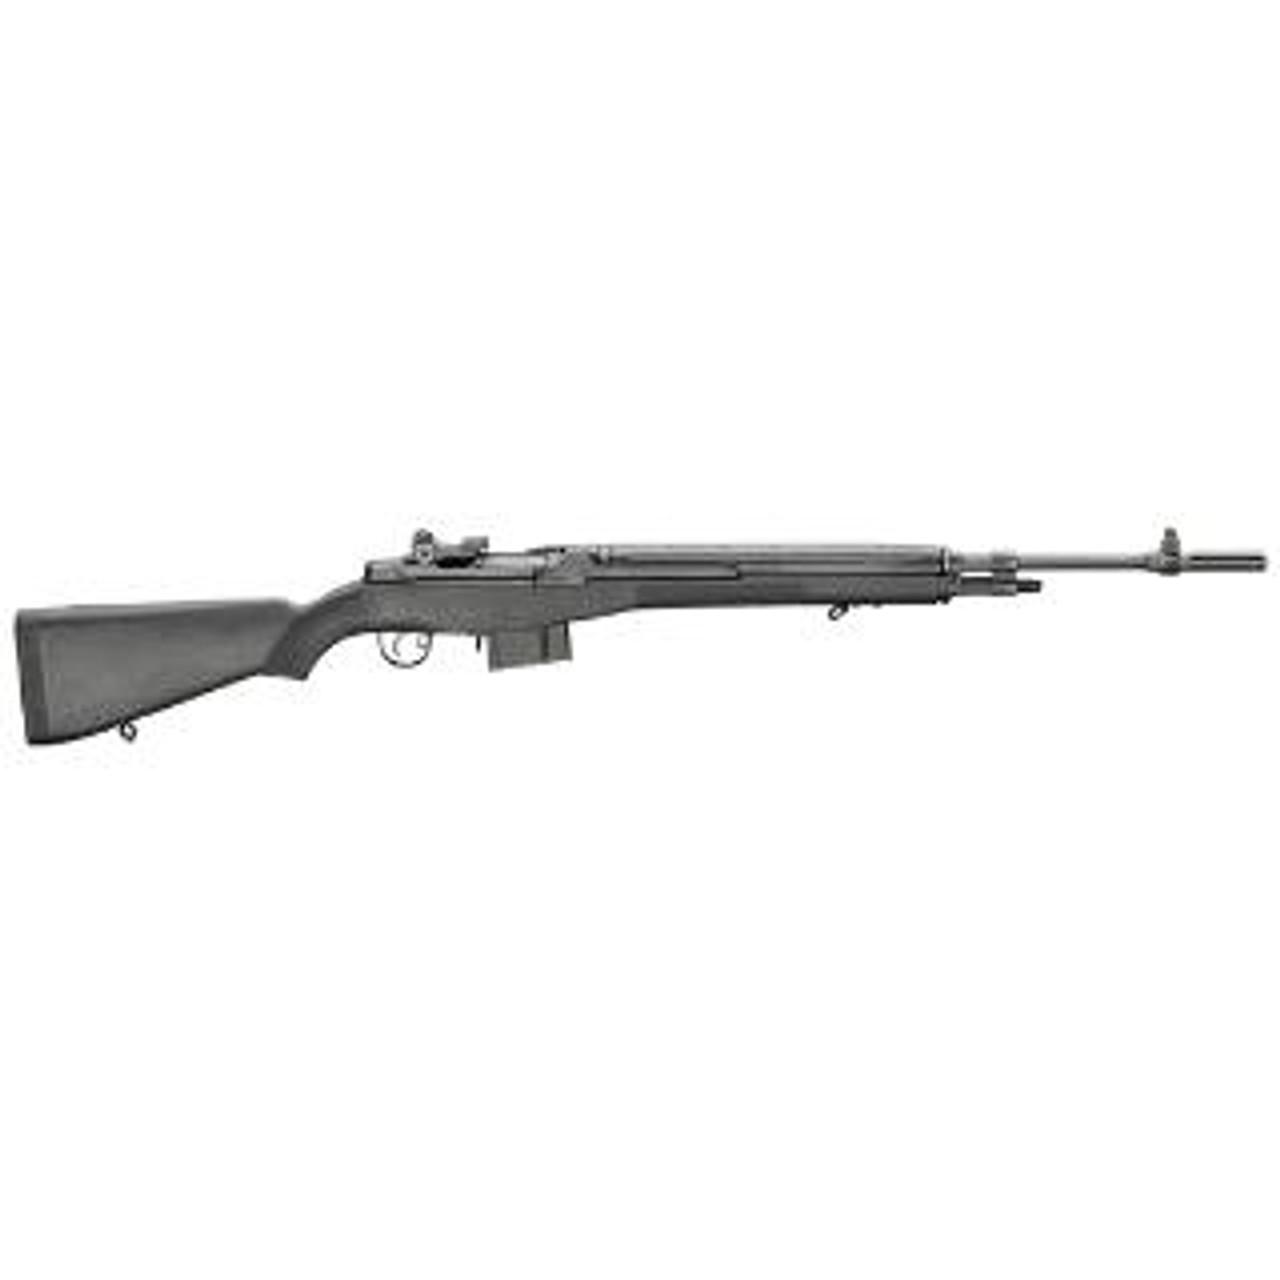 Springfield M1A Loaded CALIFORNIA LEGAL - .308/7.62x51